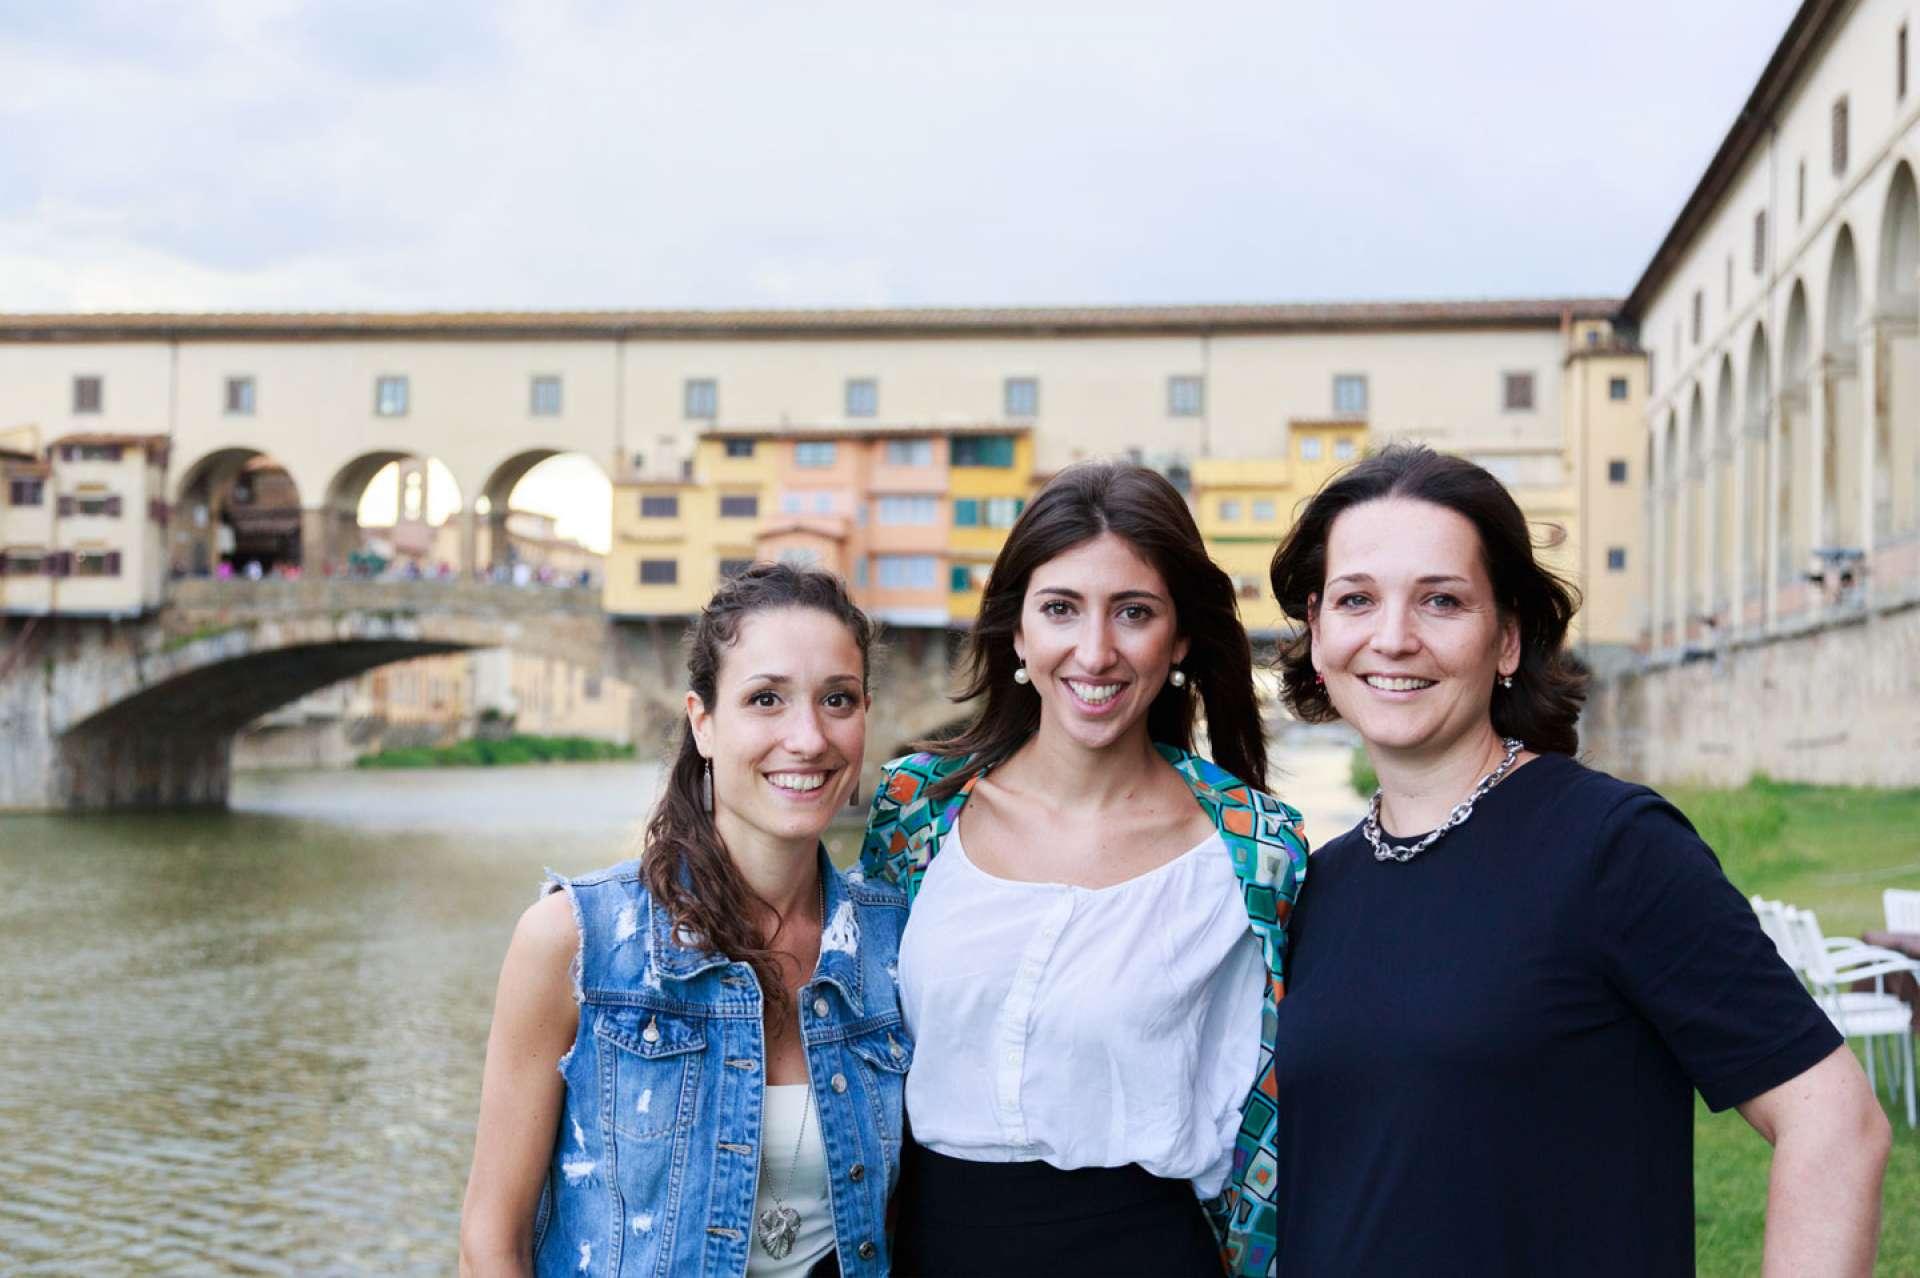 Taols, luxury travel in Italy